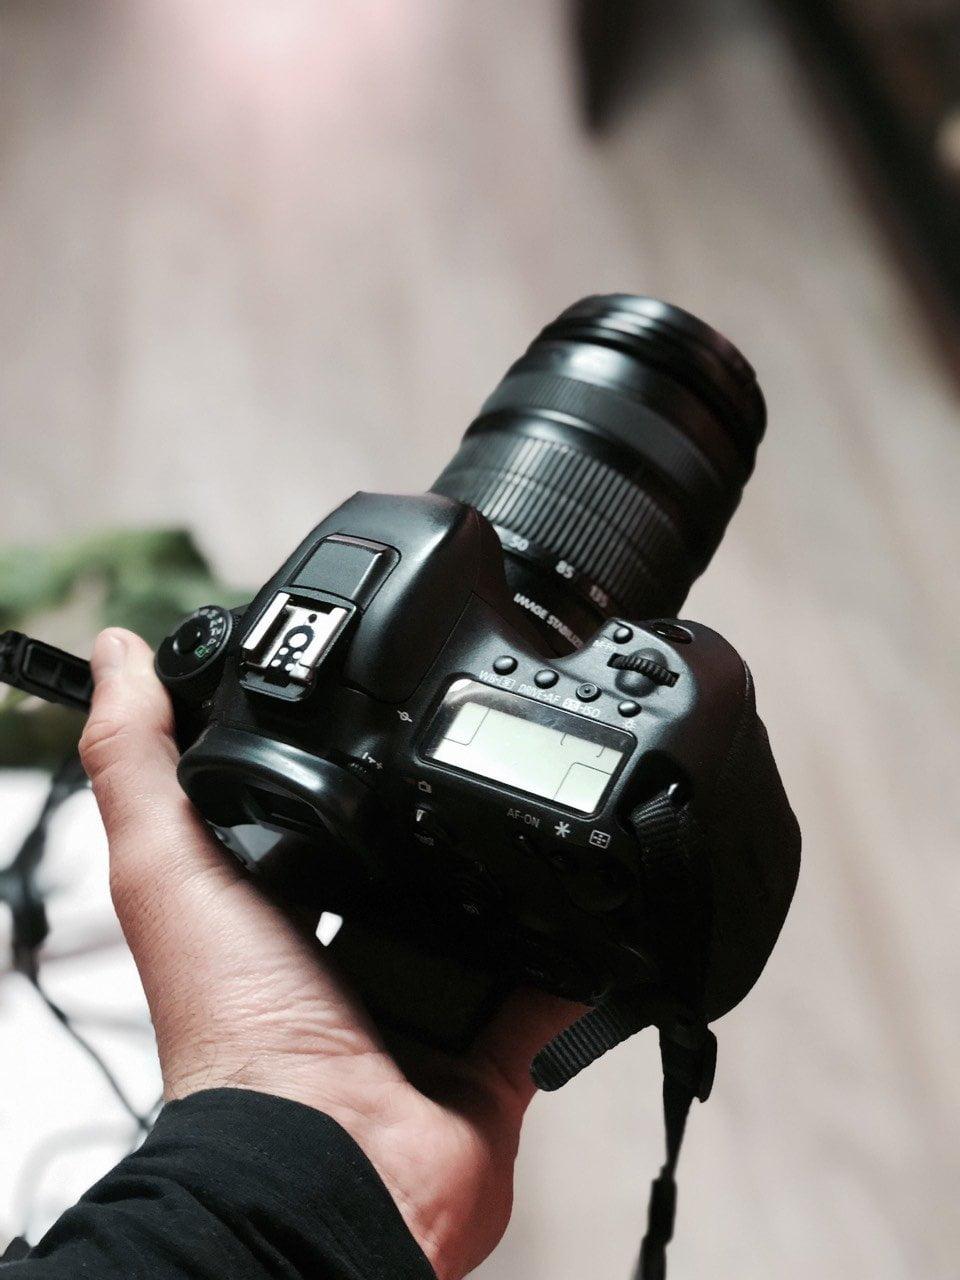 Mediji, aparat, ilustrcija, foto: M. Miladinović